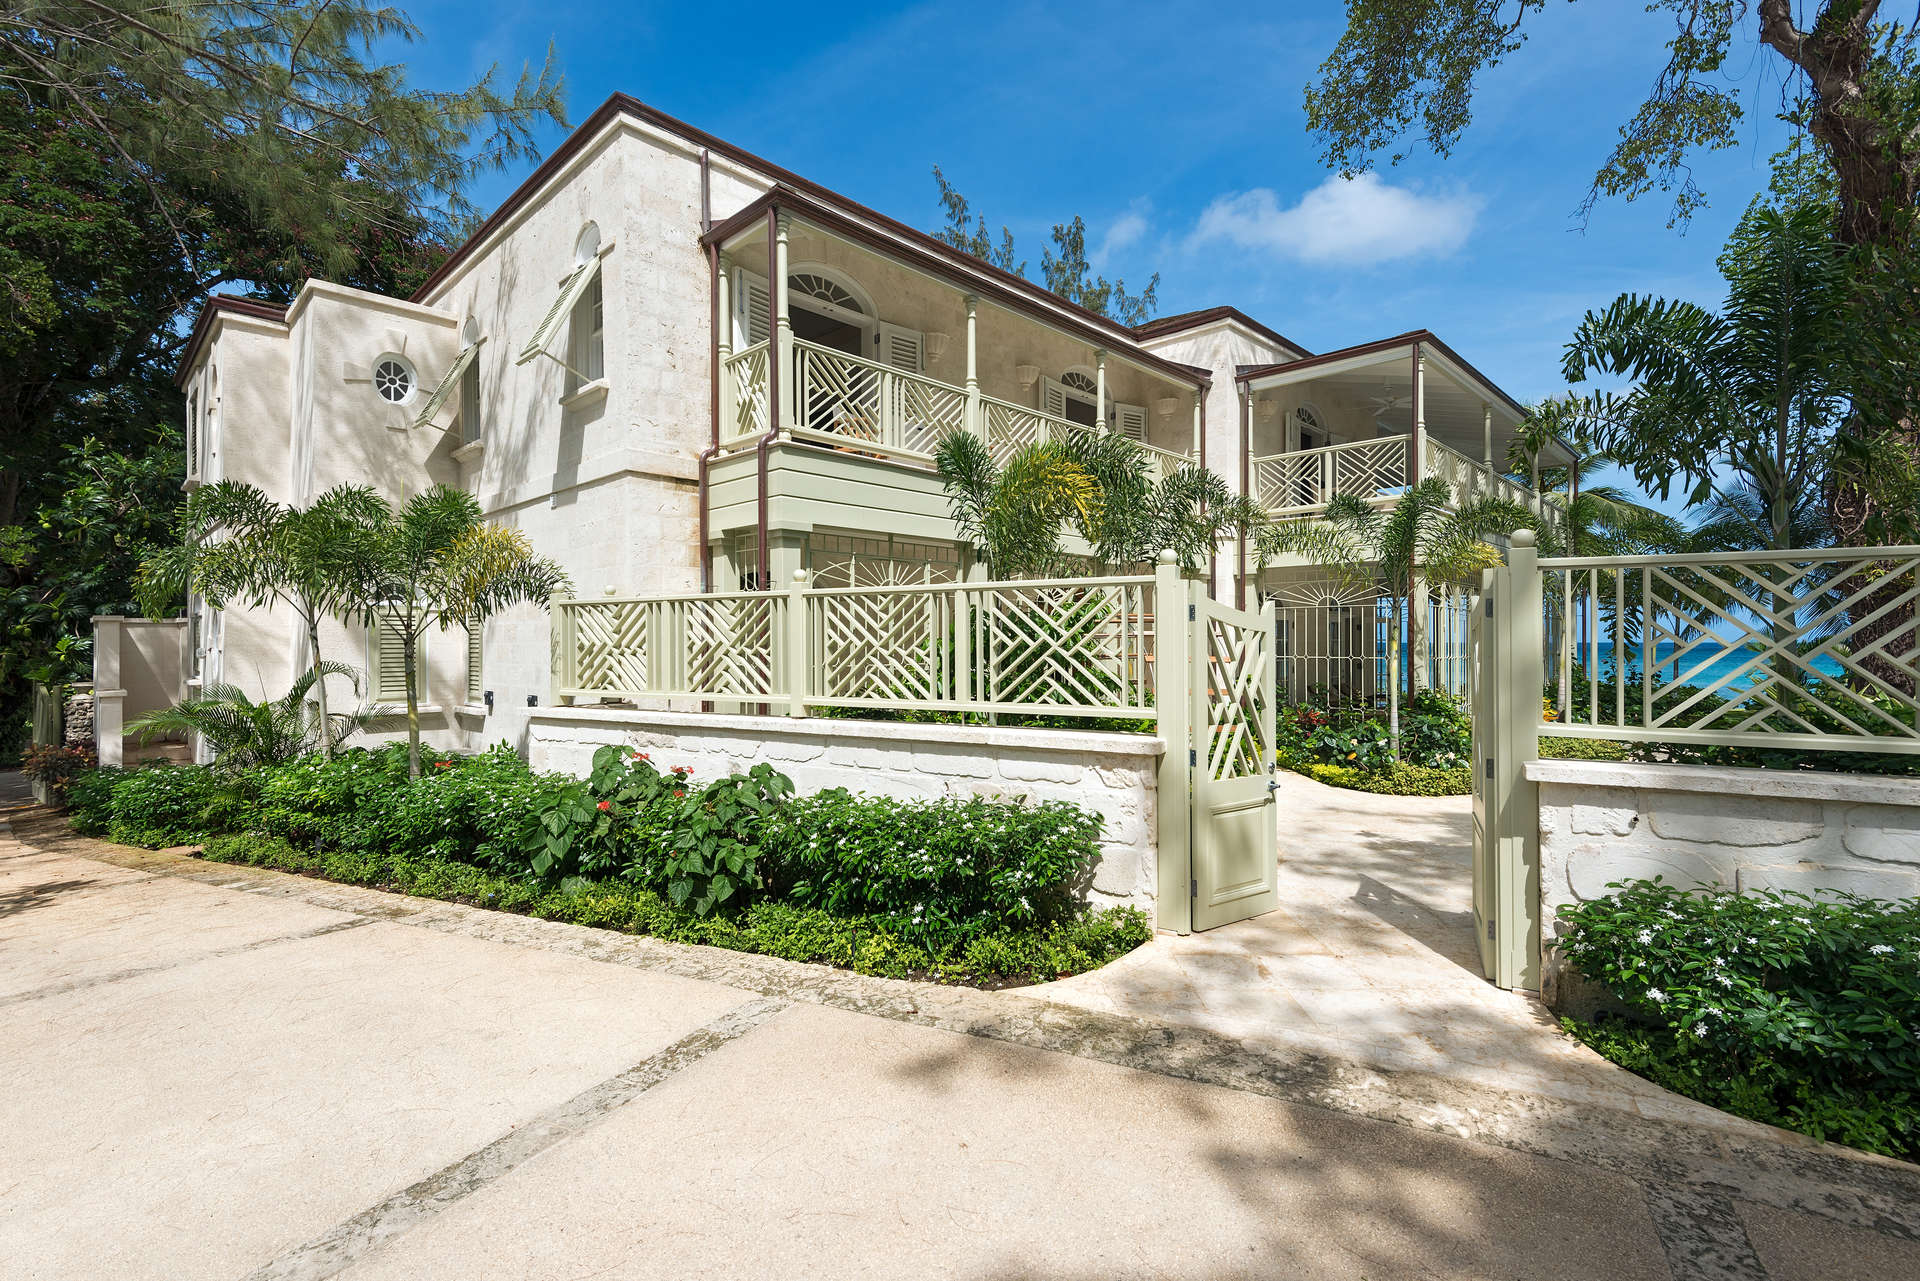 Luxury villa rentals caribbean - Barbados - St peter - Gibbes - Hemingway House - Image 1/12